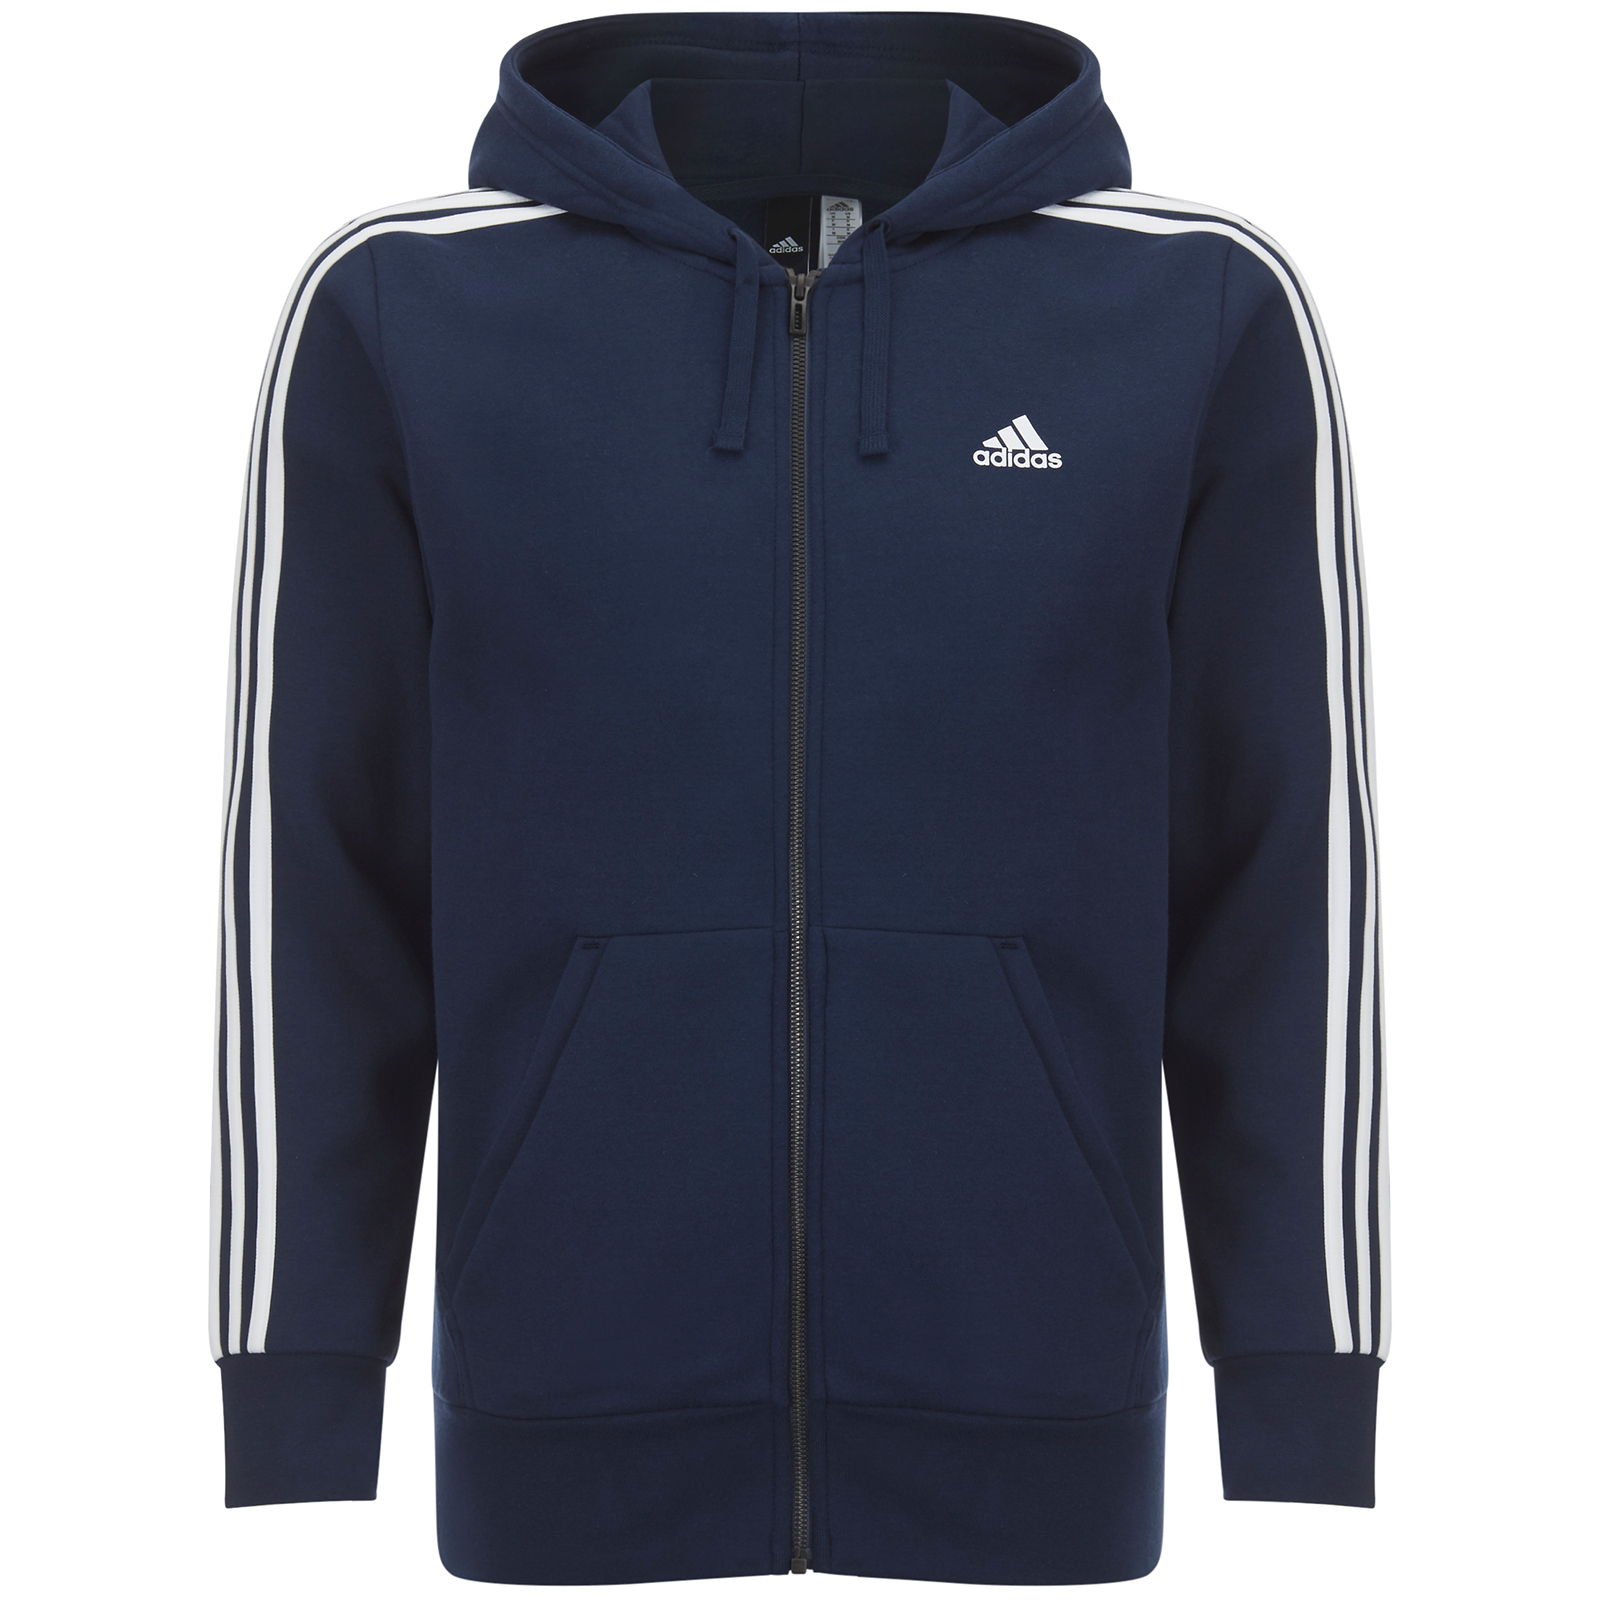 adidas essentials 3-stripes sweat-shirt bleu marine homme